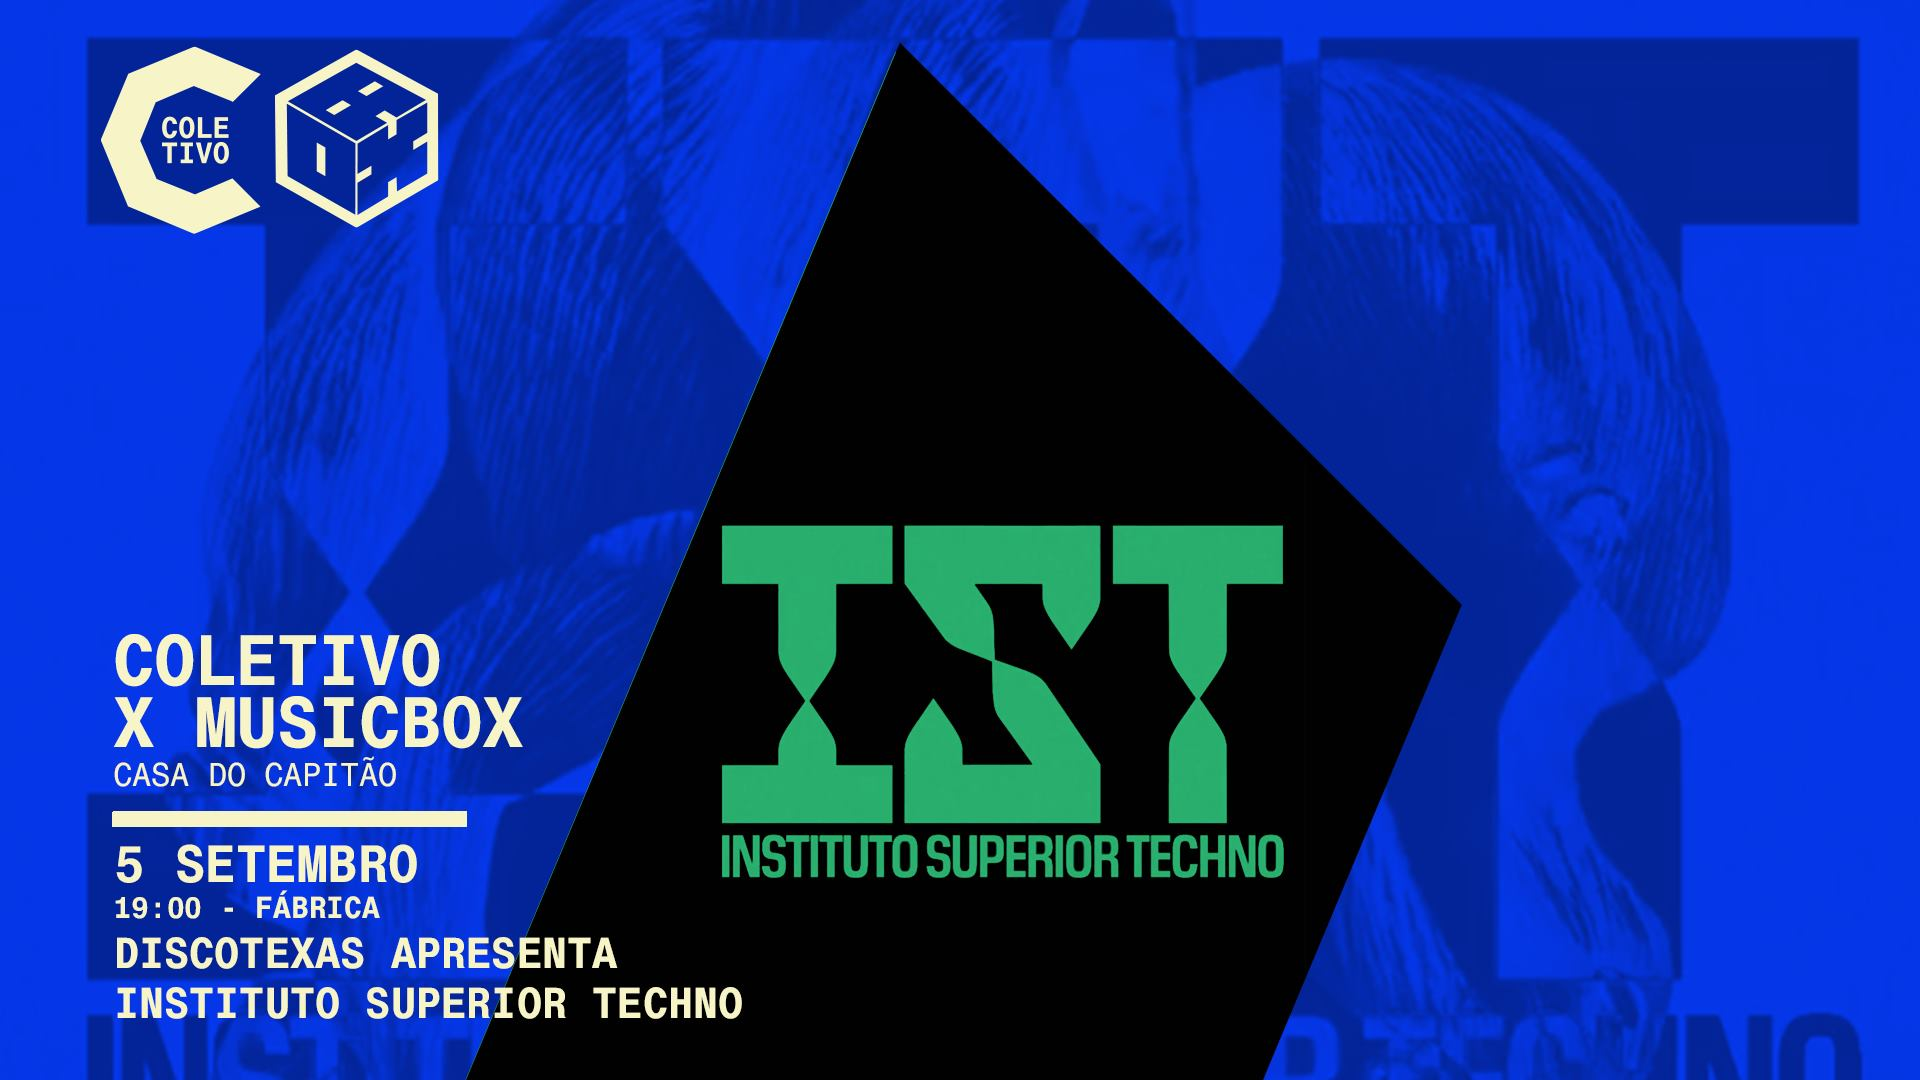 Discotexas apresenta Instituto Superior Techno • concerto na fábrica